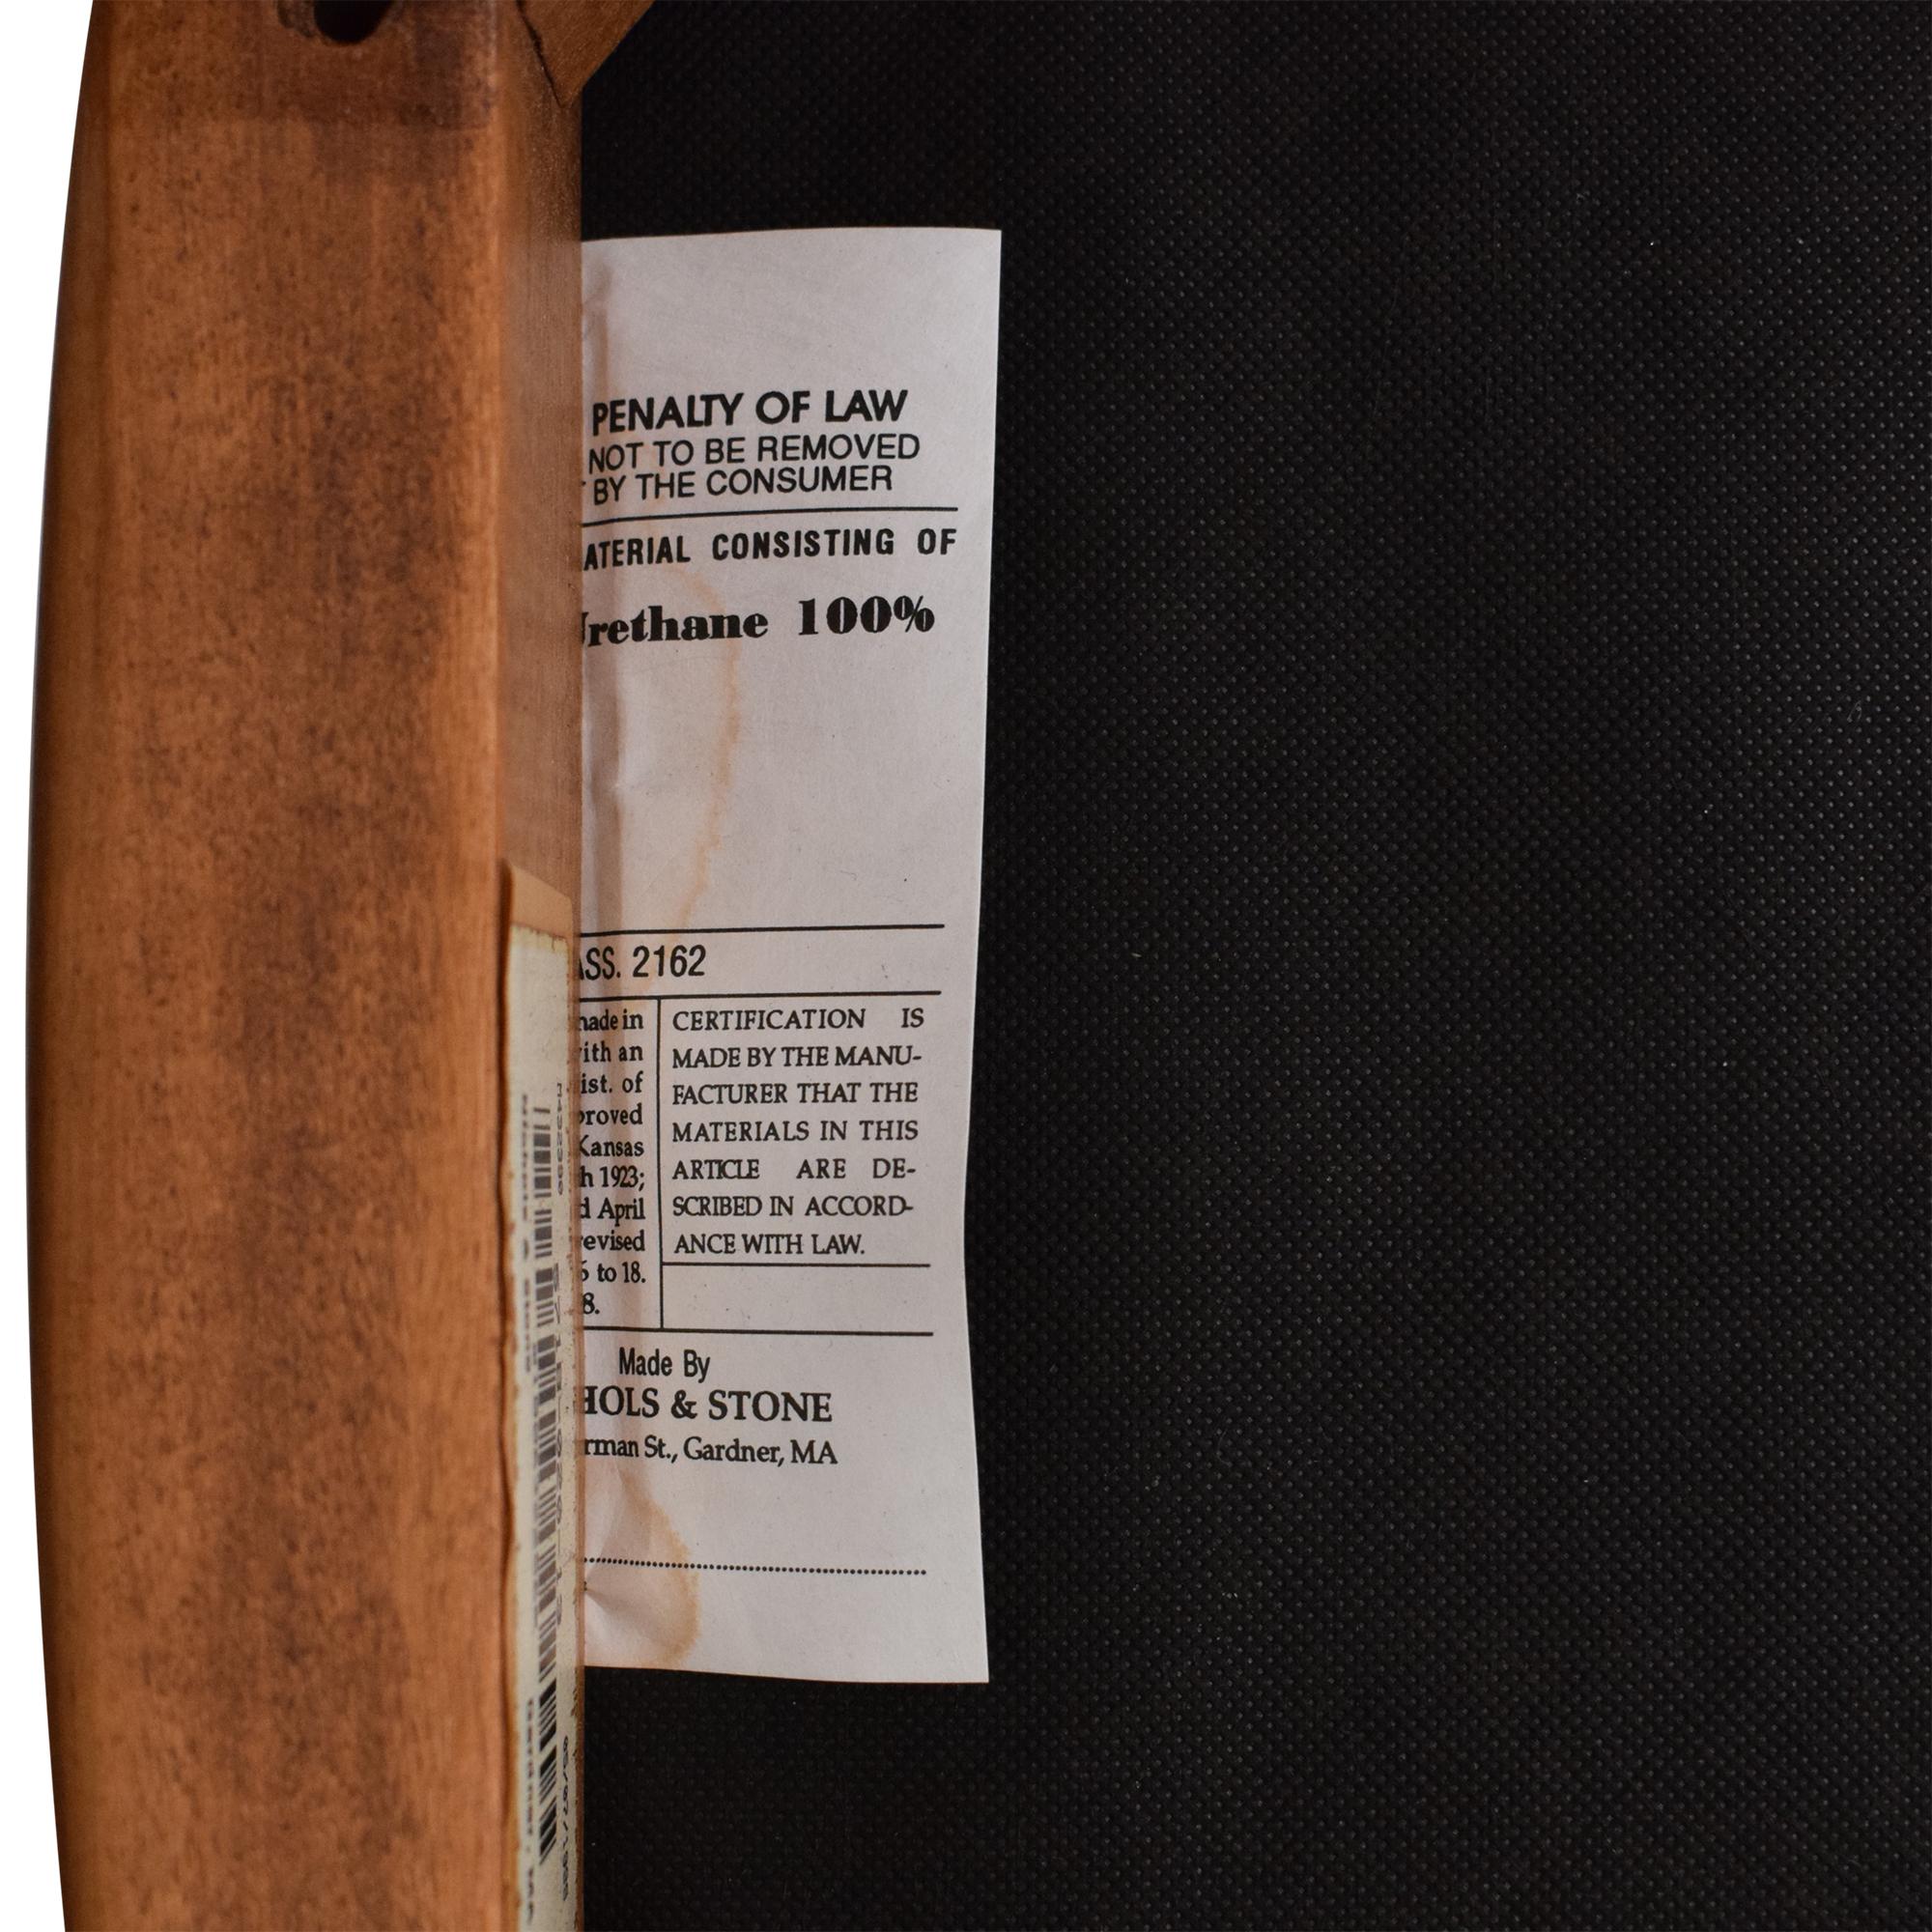 Nichols & Stone Nichols & Stone Upholstered Dining Chairs price